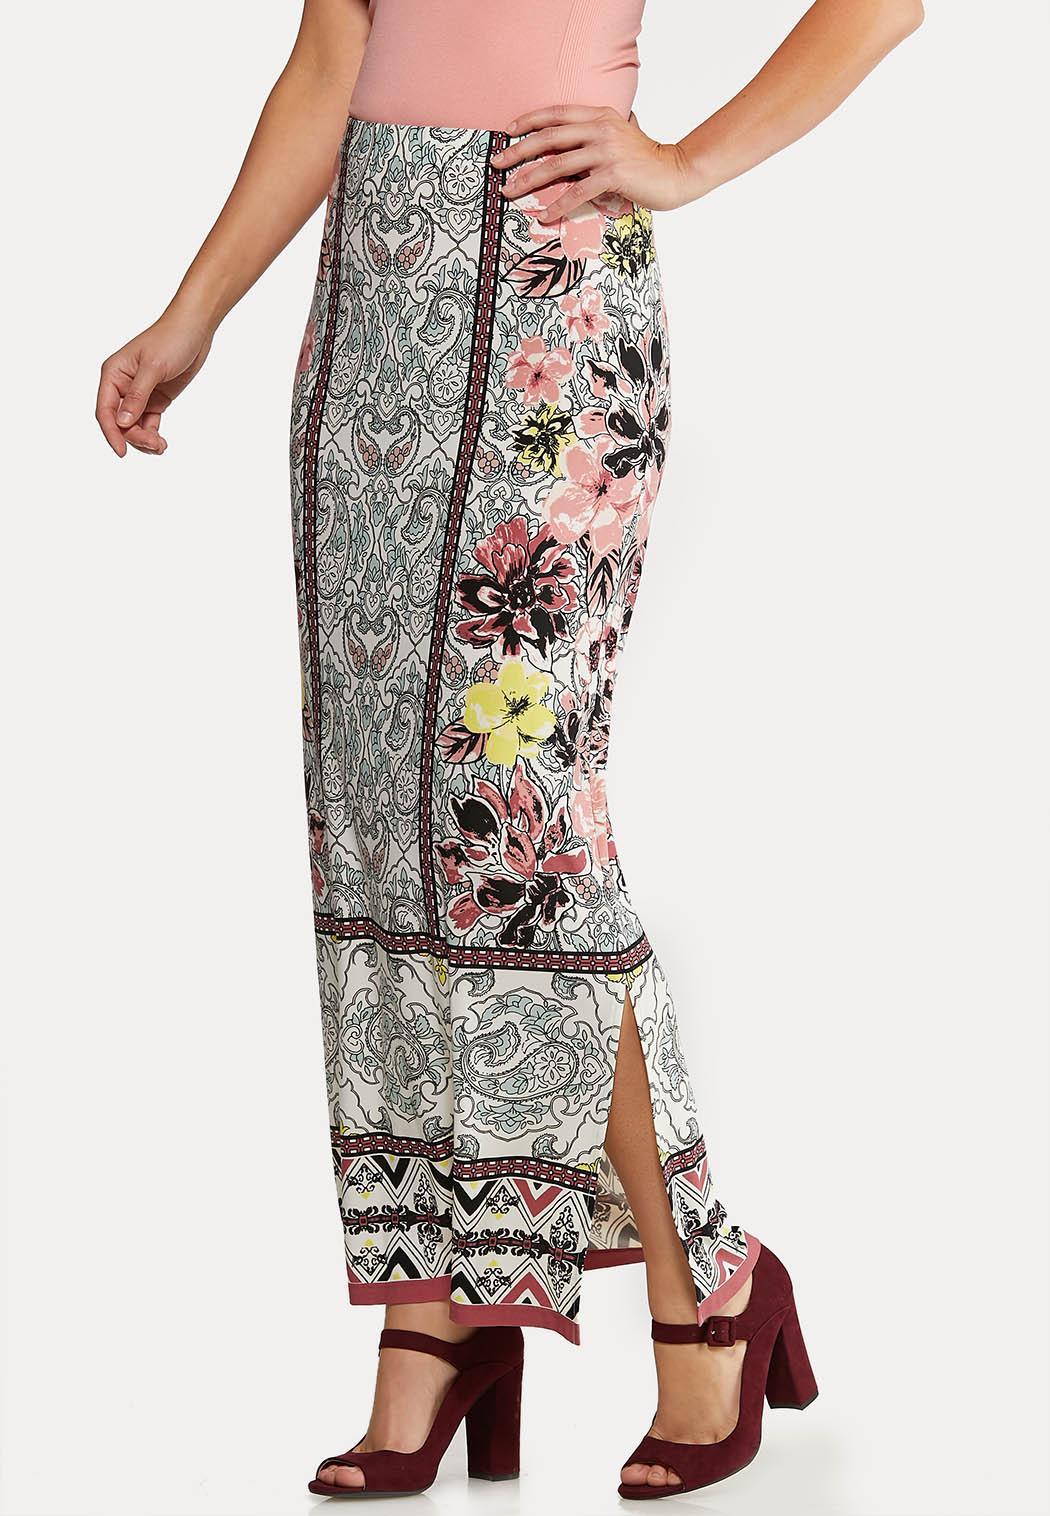 Spring Floral Maxi Skirt